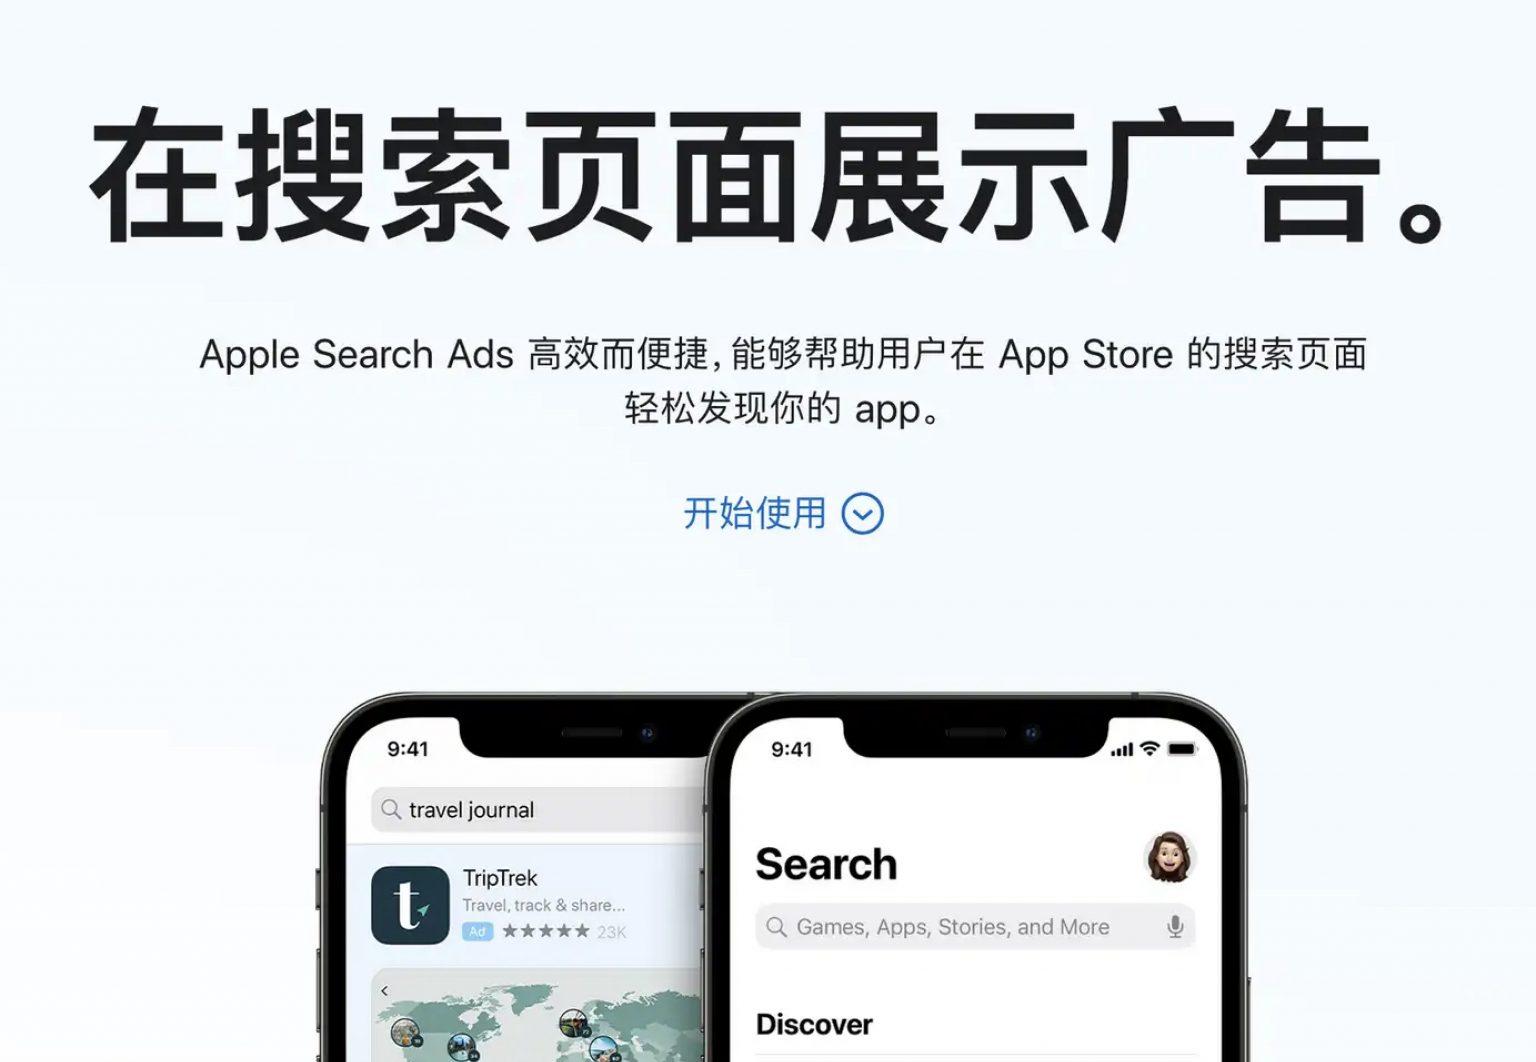 Apple search ads China